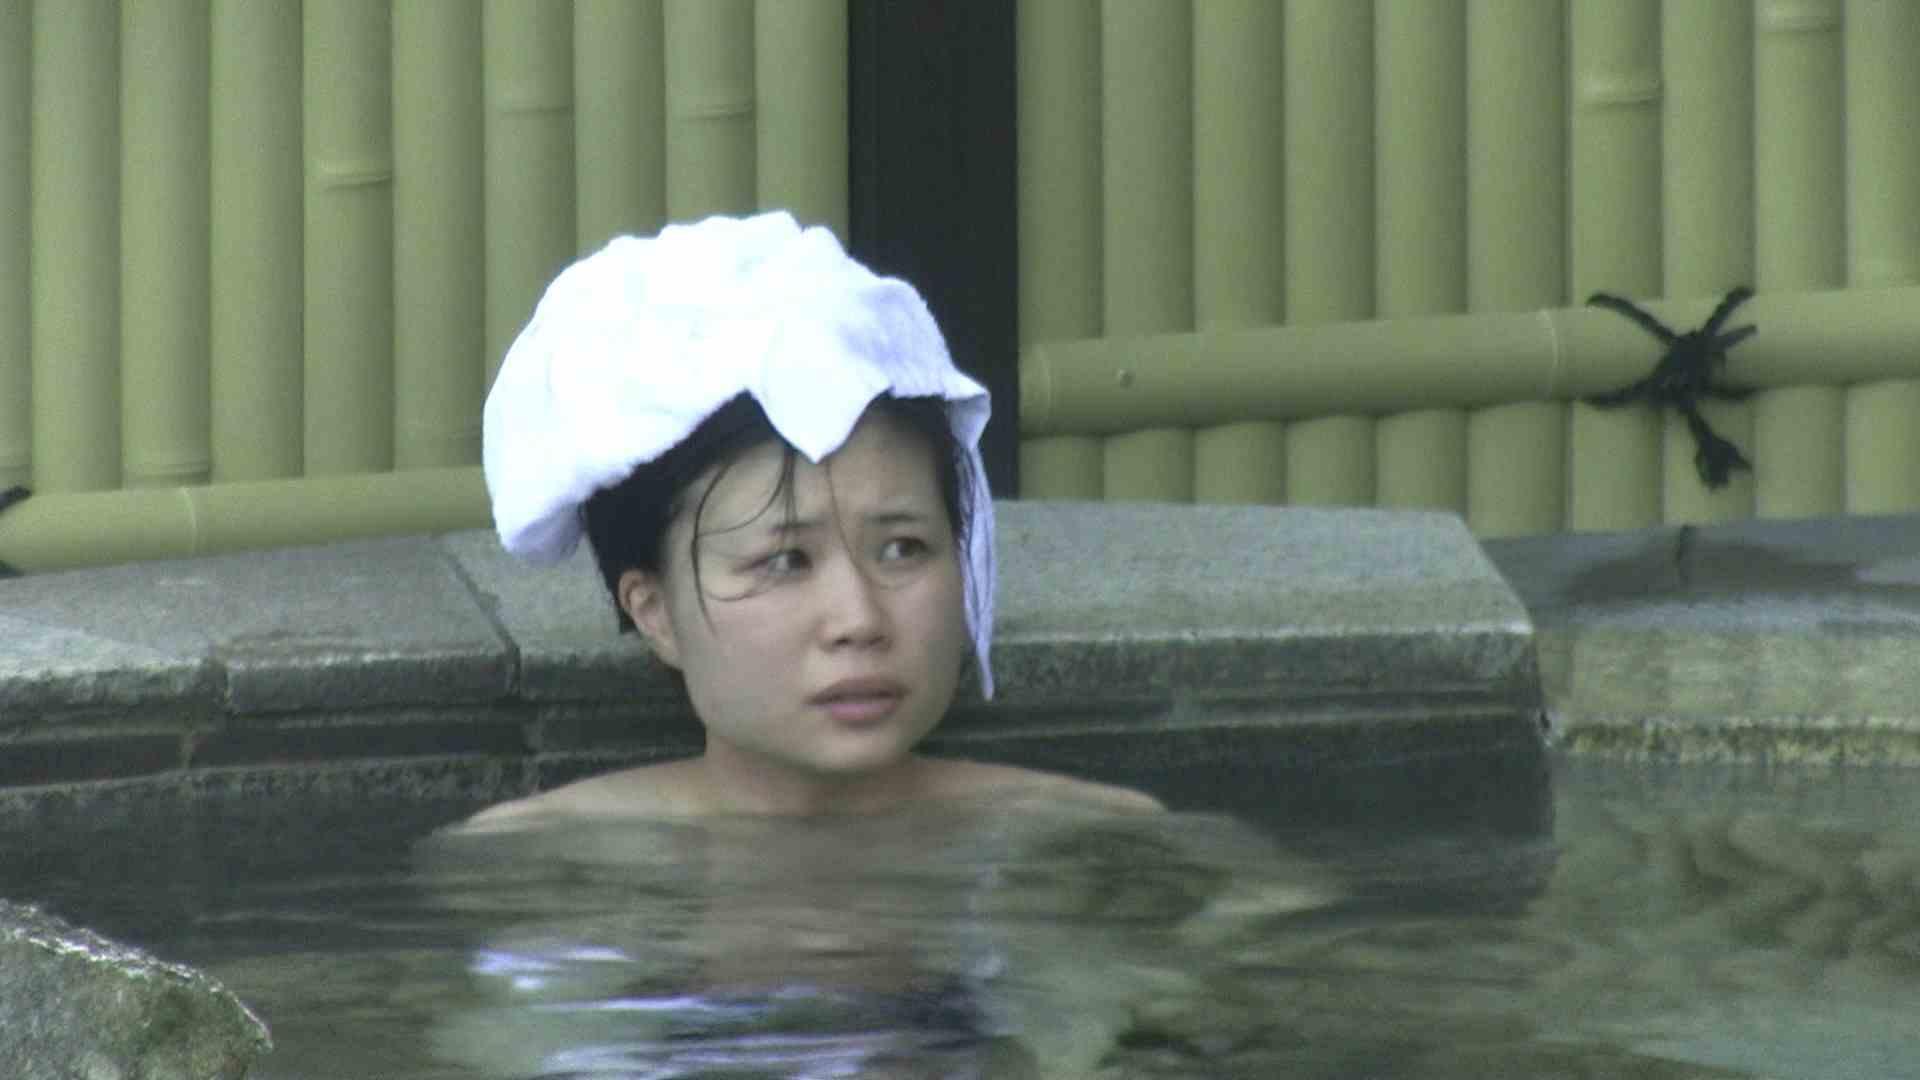 Aquaな露天風呂Vol.183 盗撮師作品 エロ無料画像 105pic 65